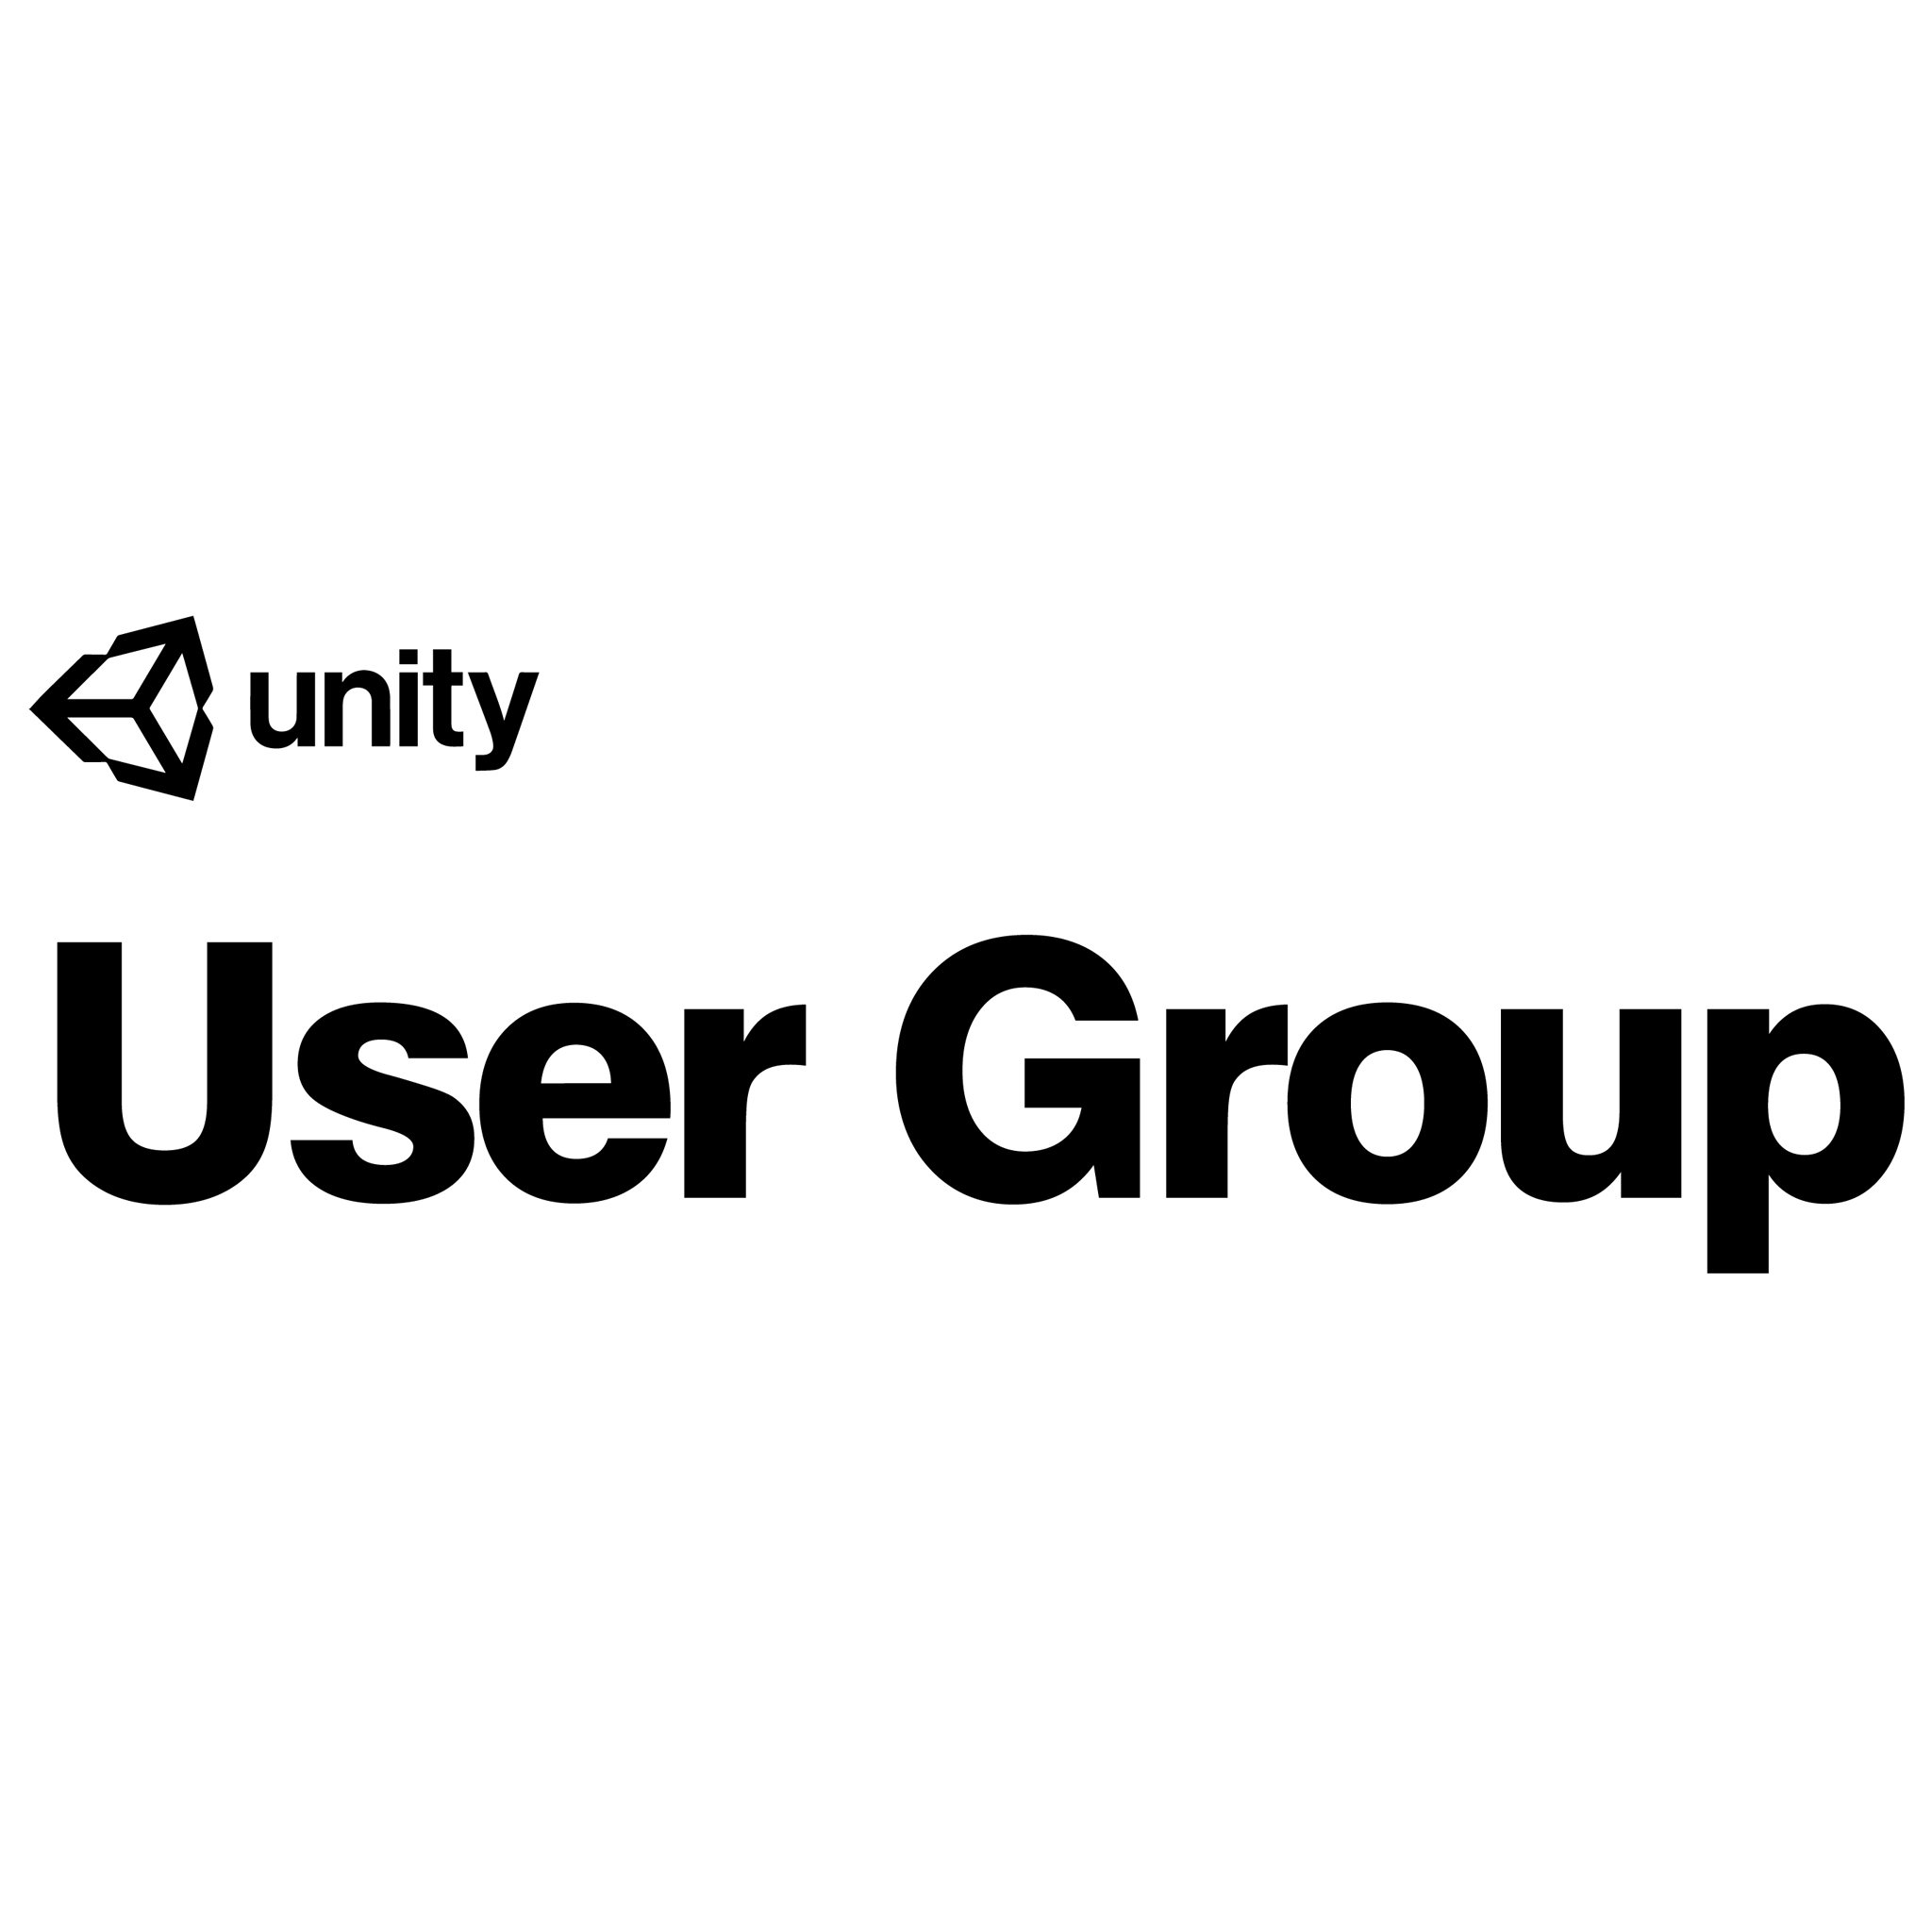 UUG南京站-2018首次技术沙龙